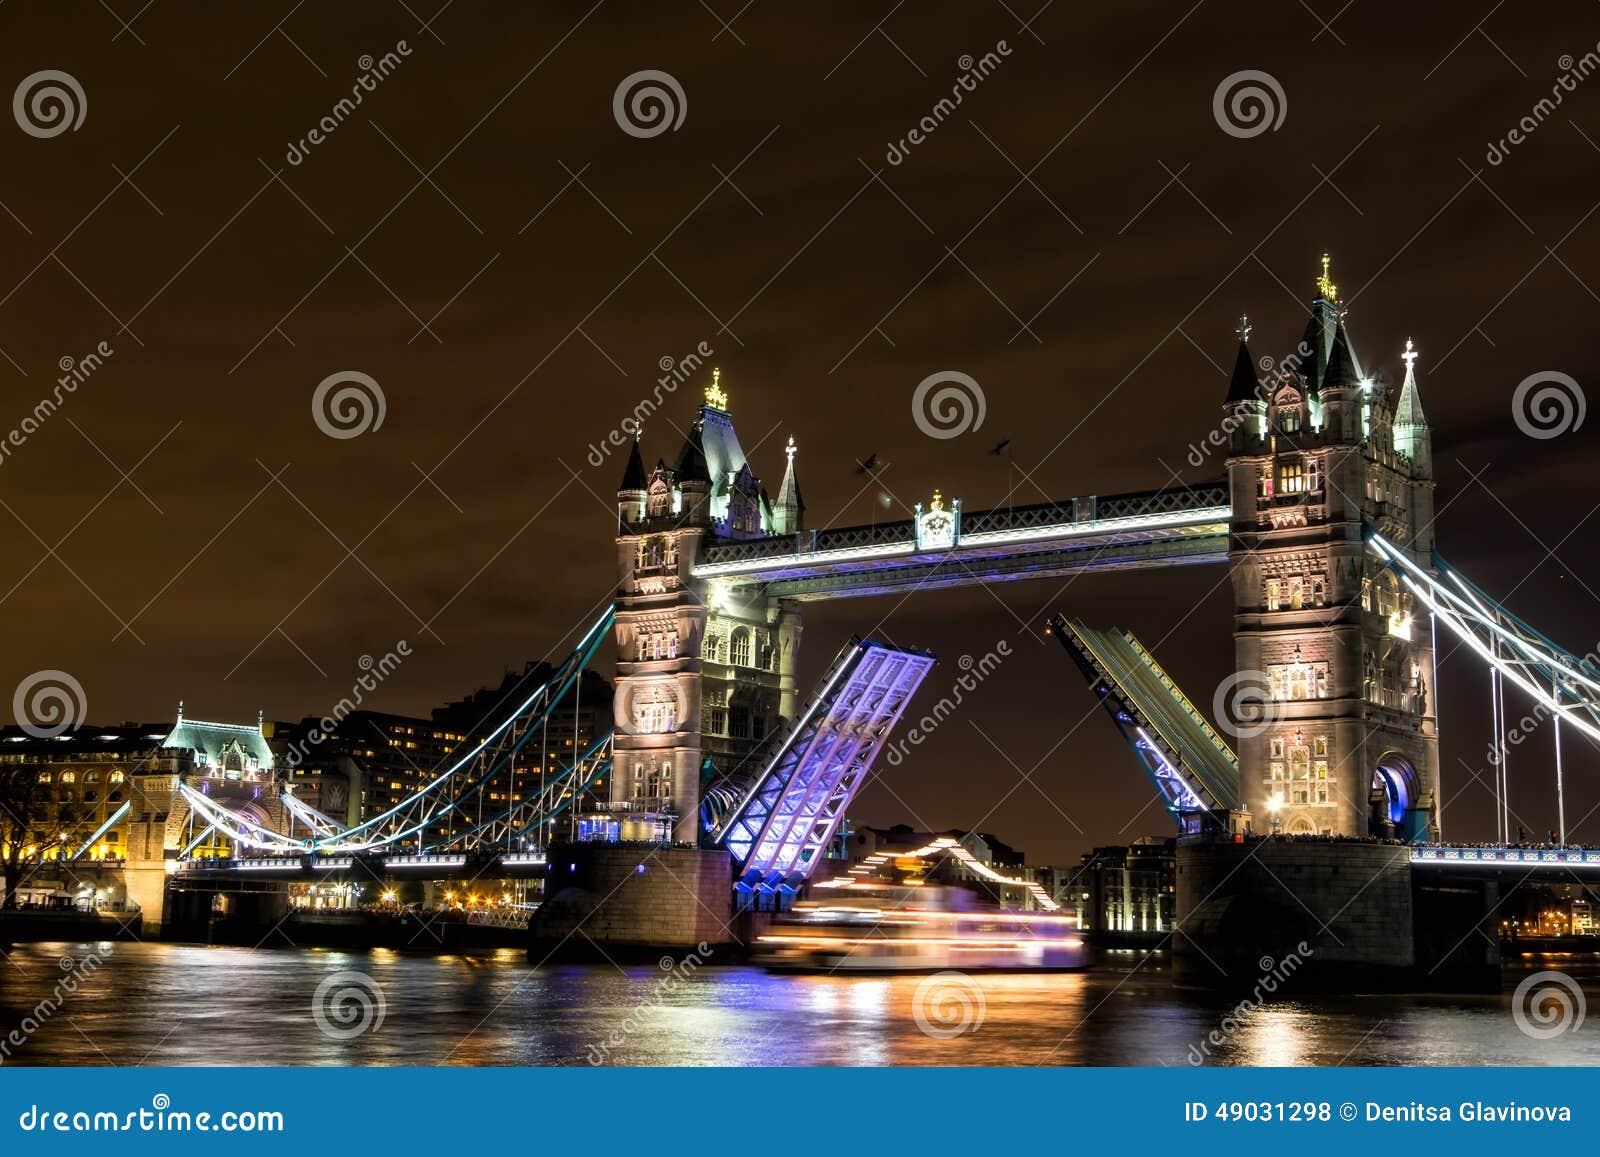 bridge gb night london - photo #49